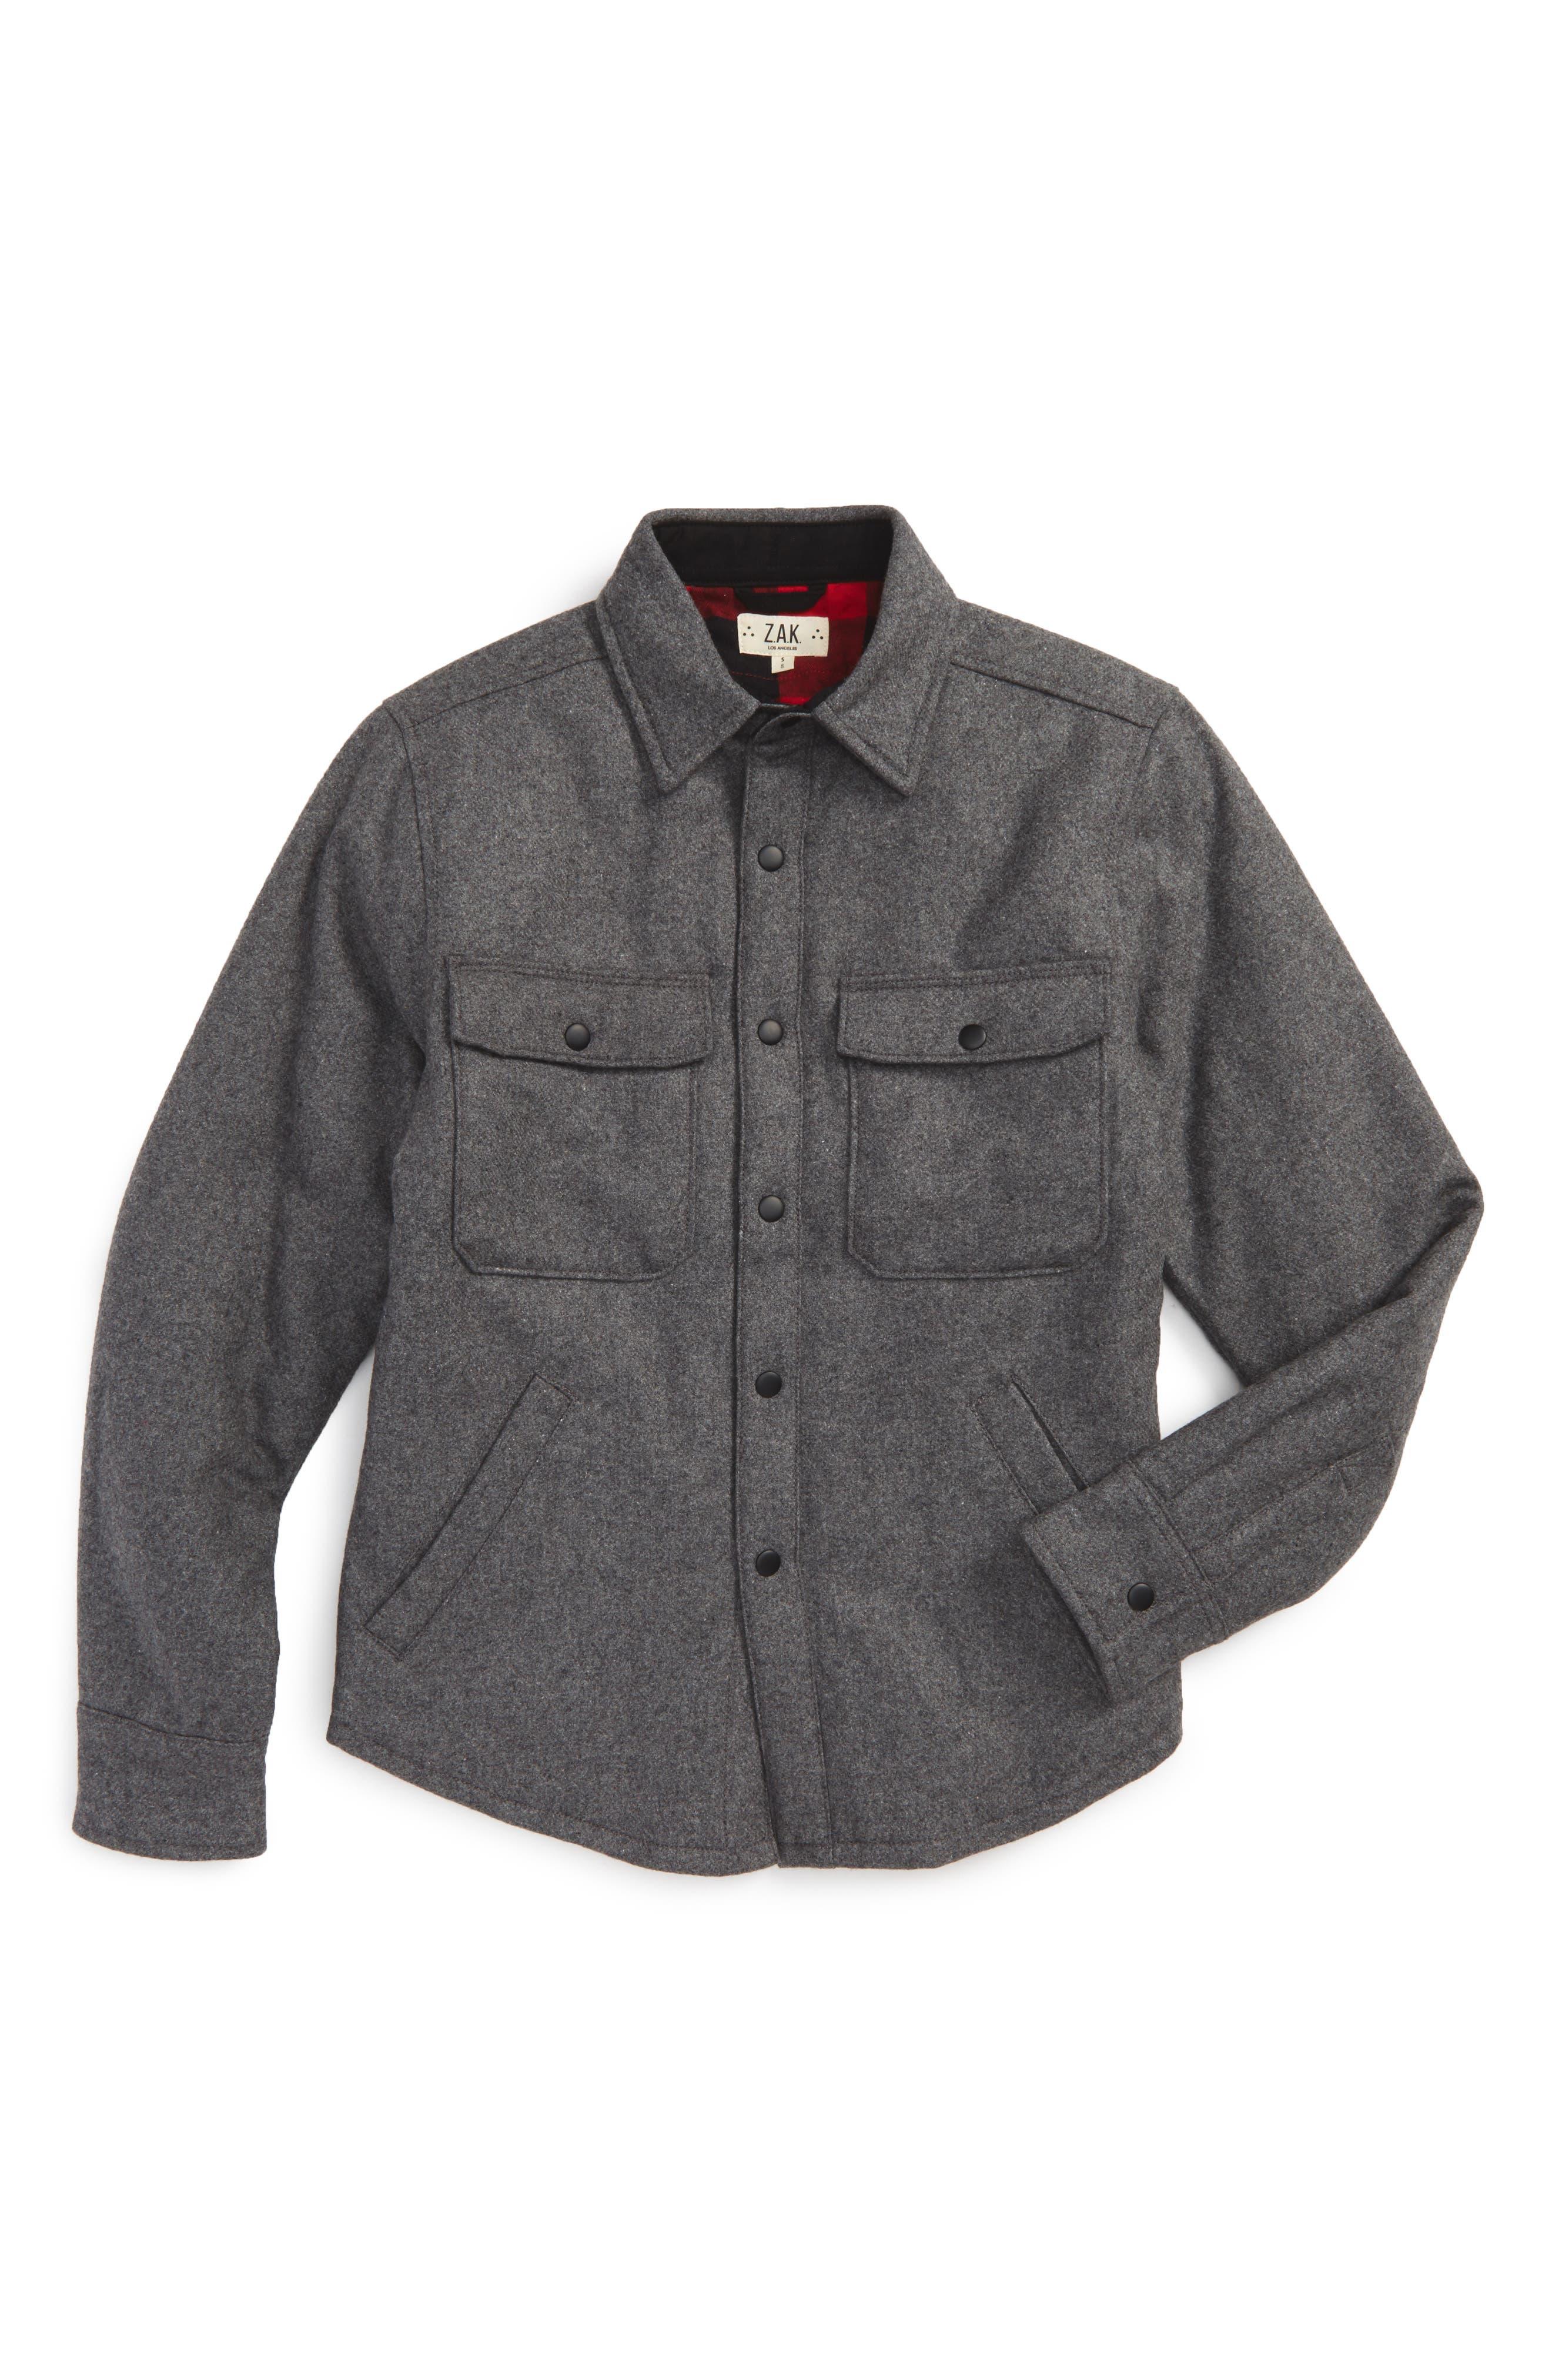 Z.A.K. Brand Flannel Shirt Jacket (Little Boys)